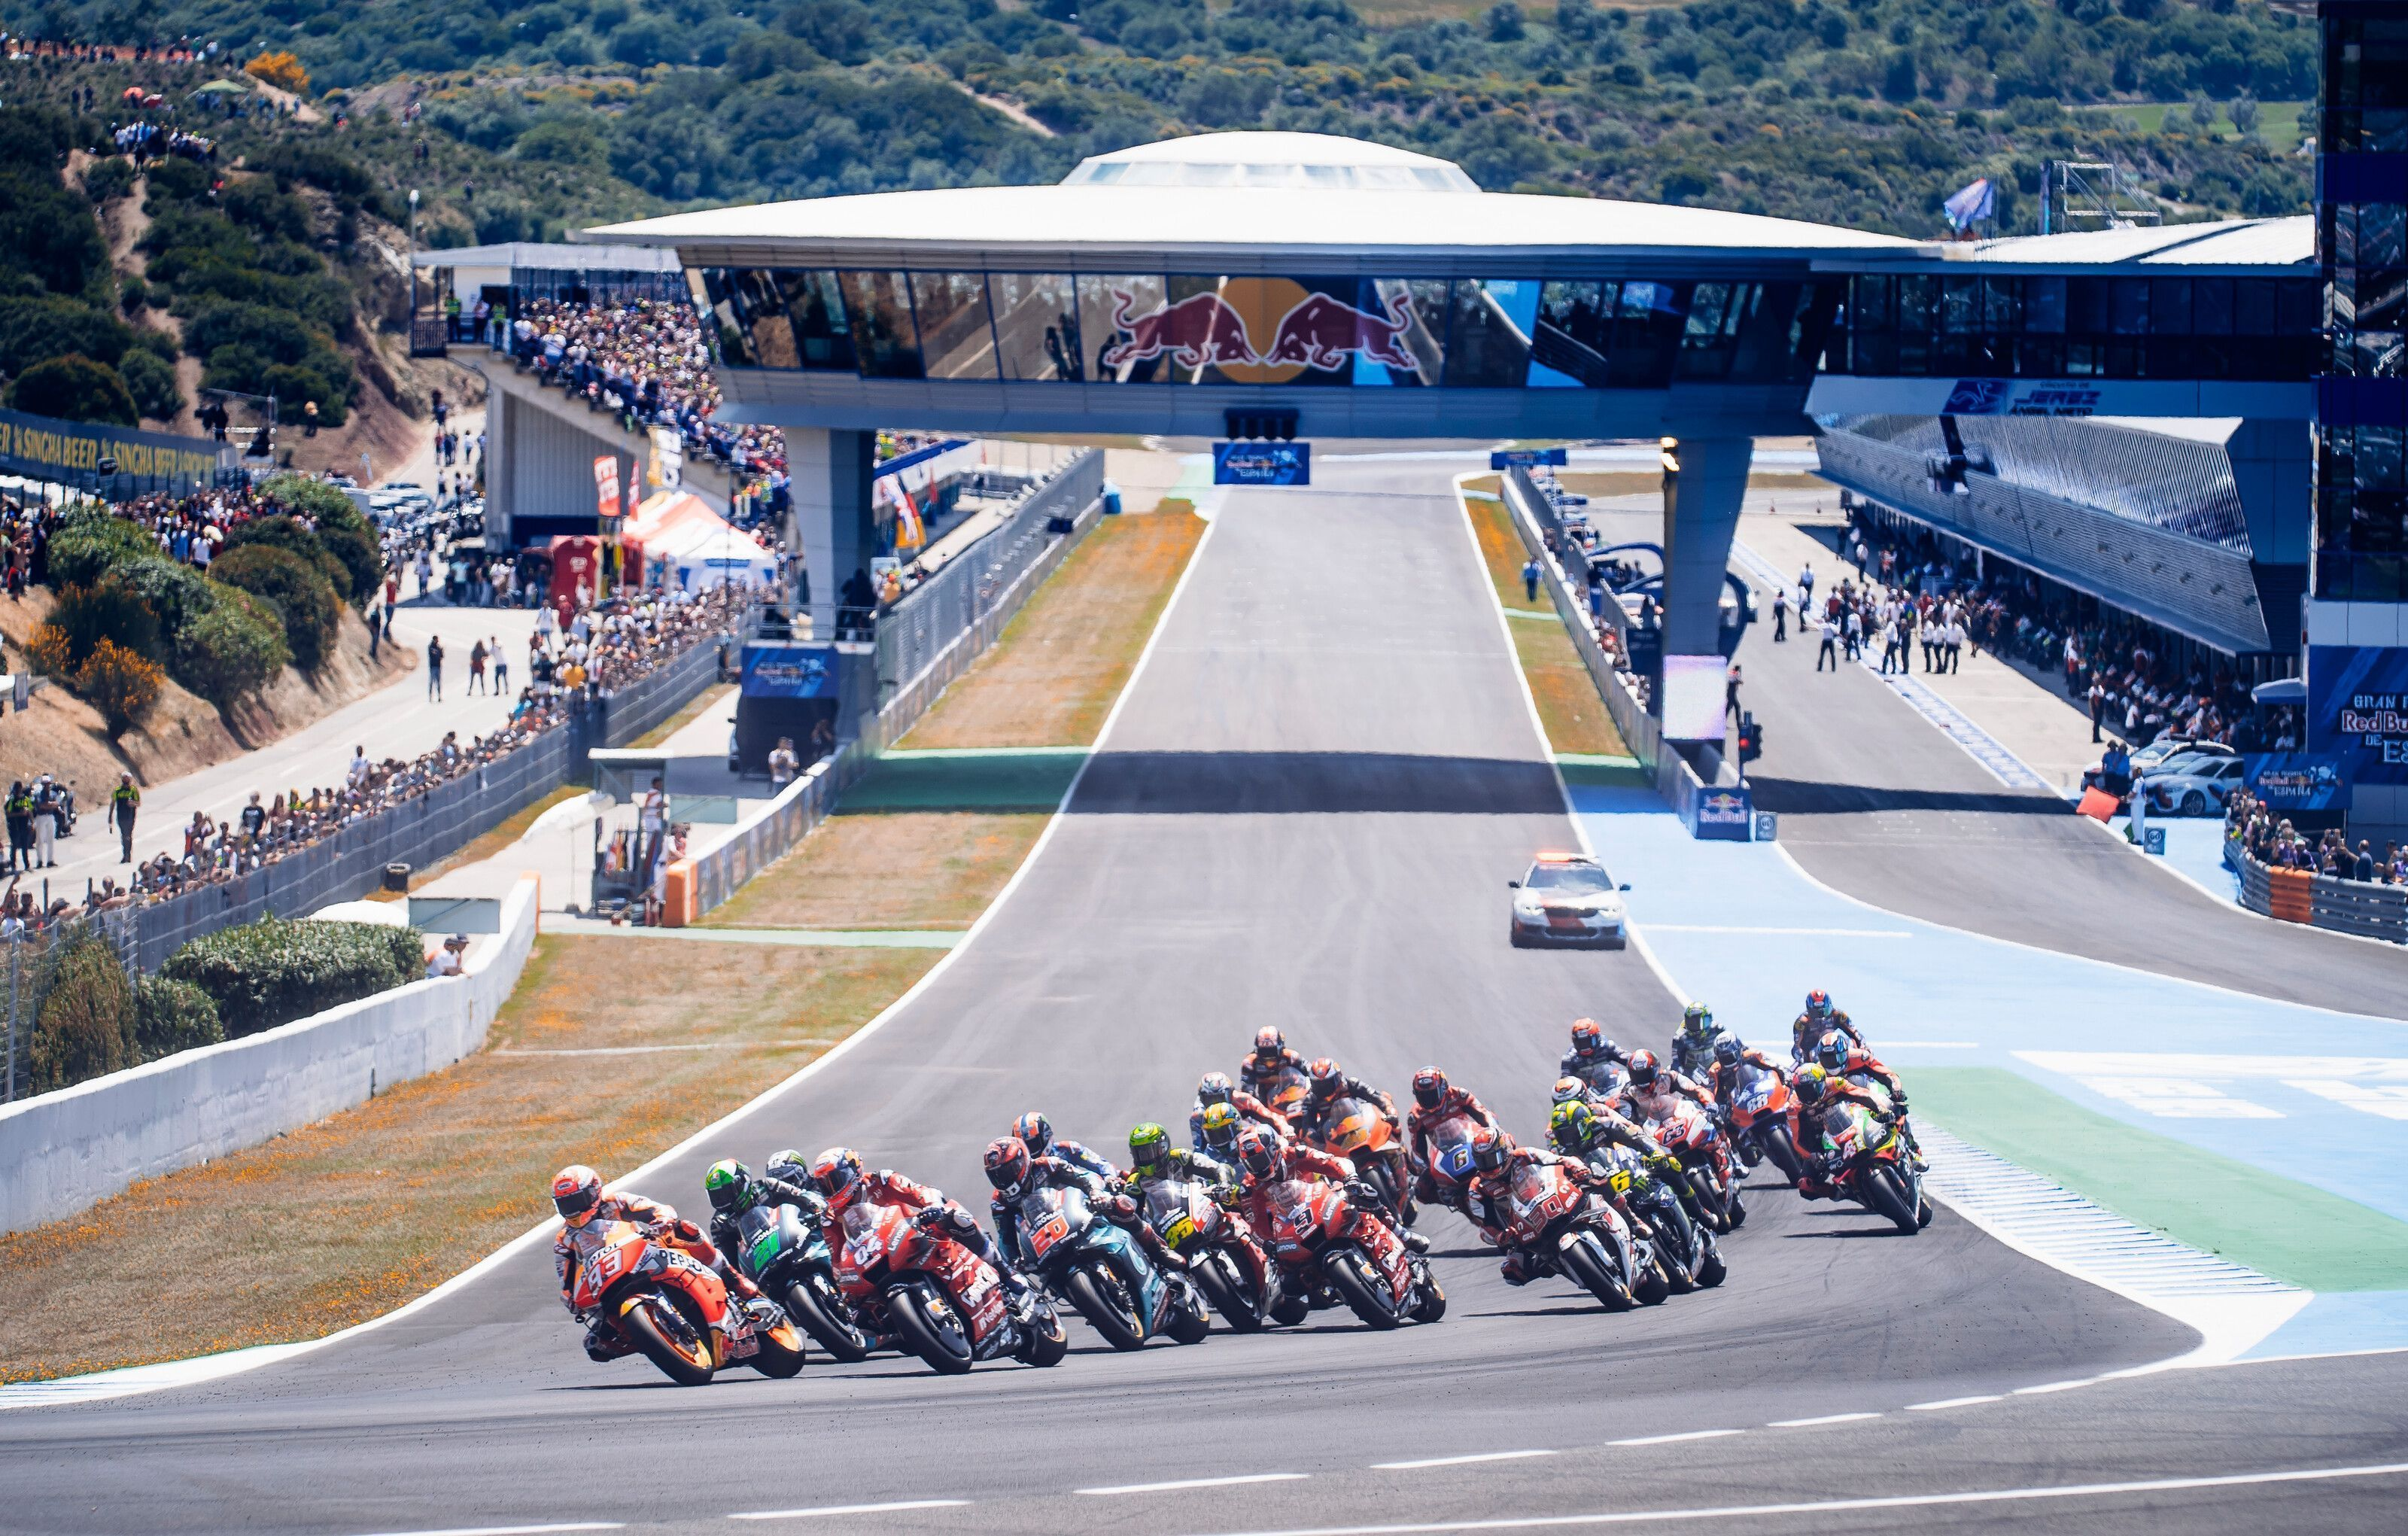 MotoGP, Spanish GP